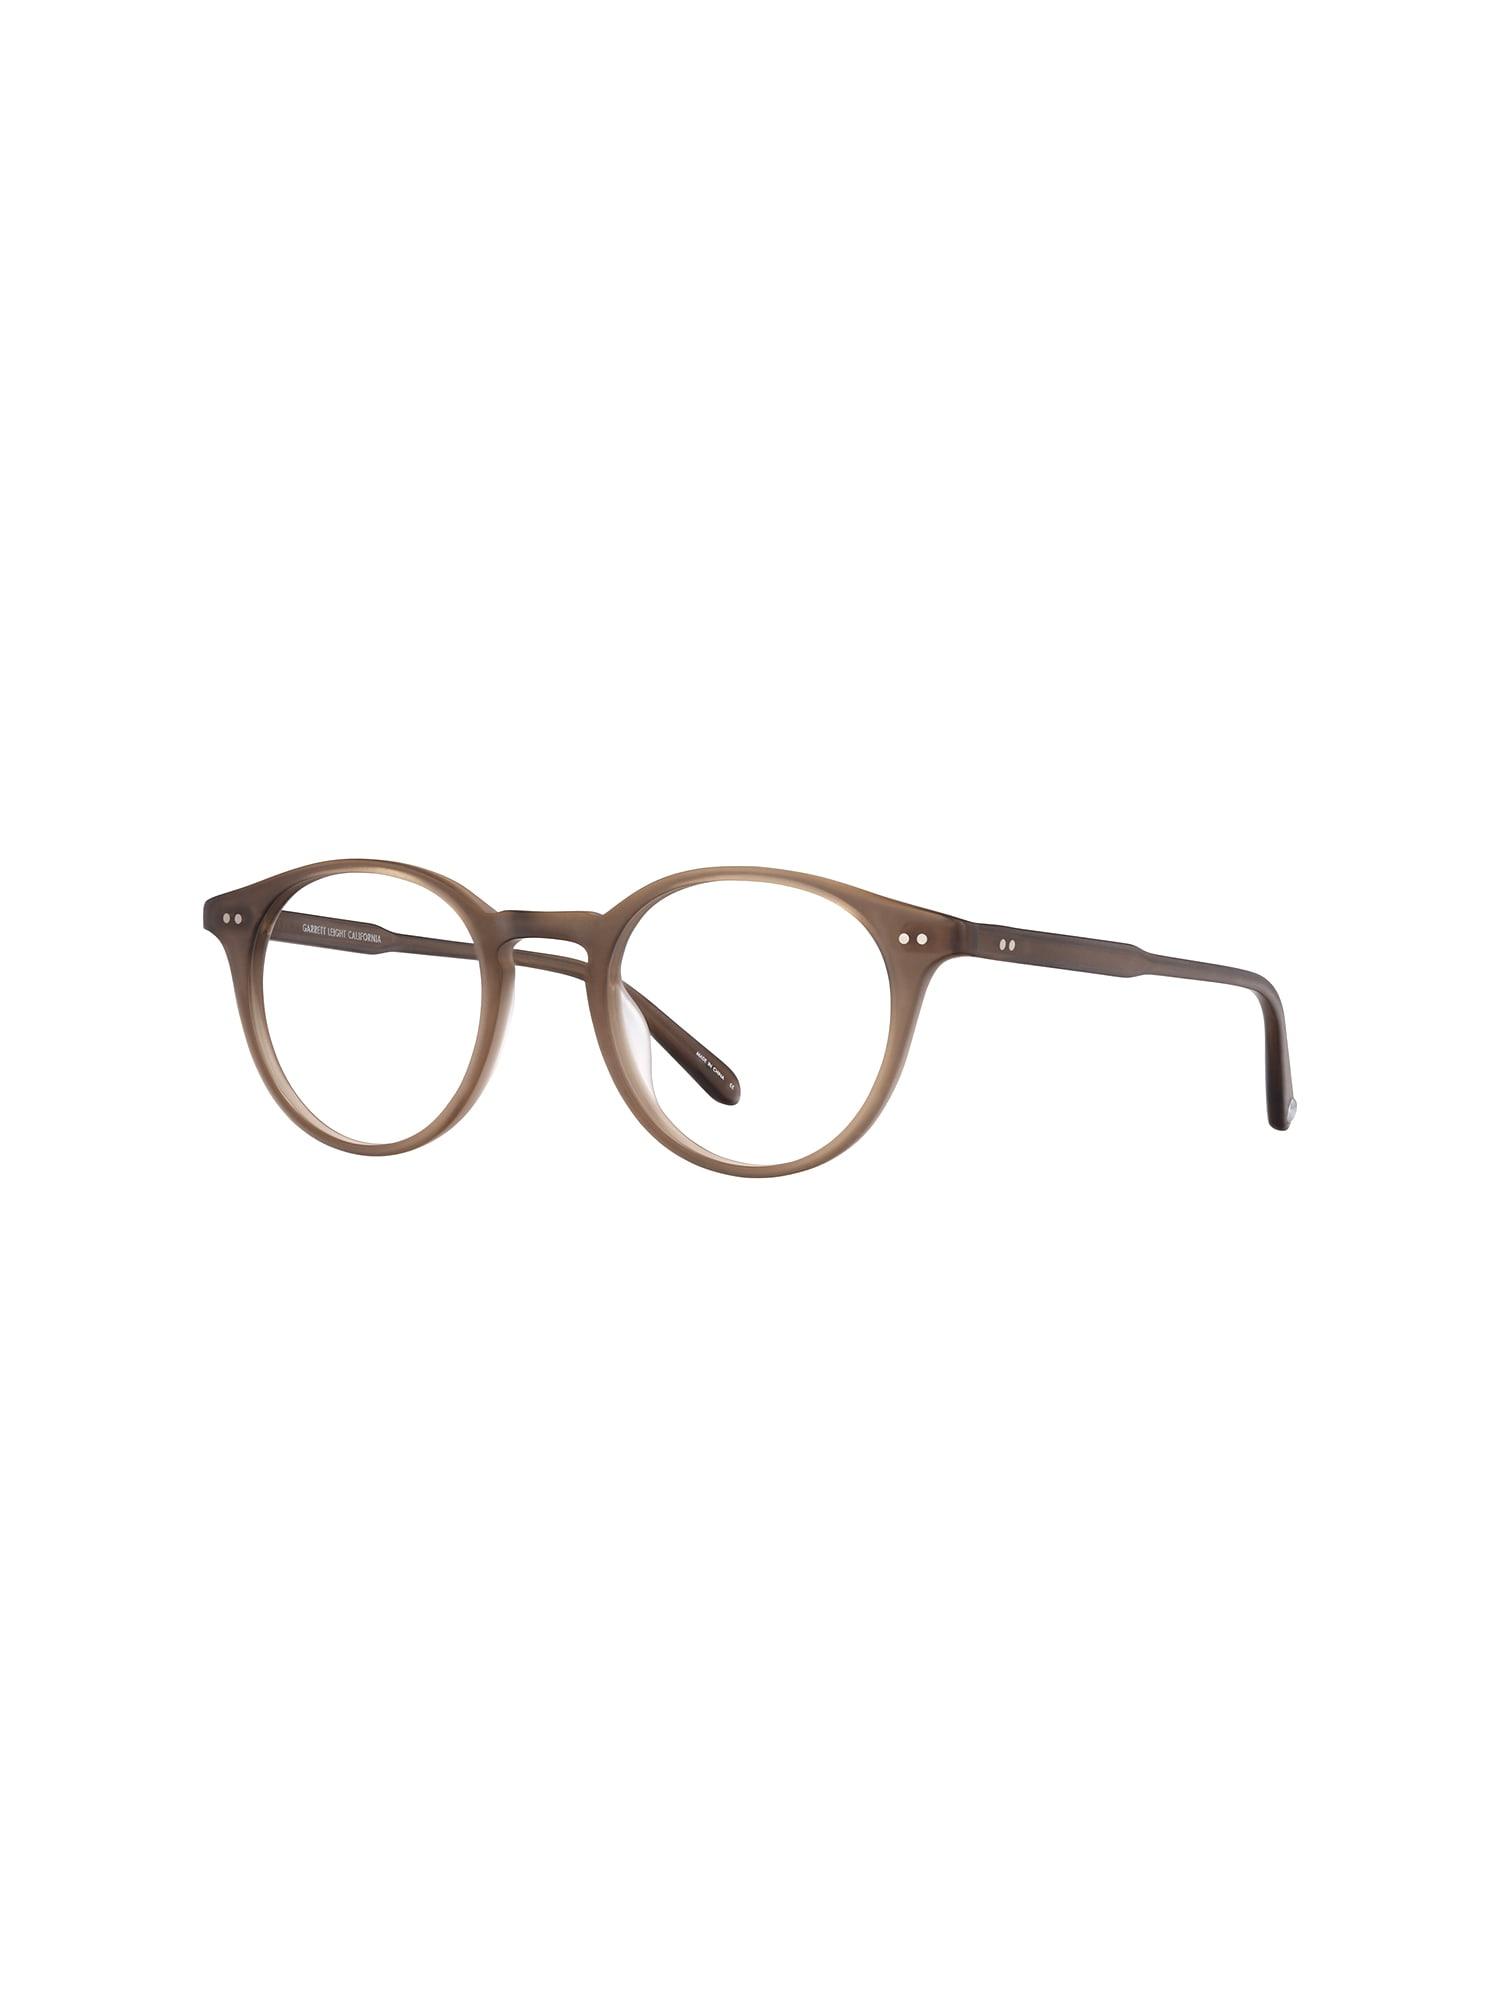 Garrett Leight 1047/45 CLUNE Eyewear